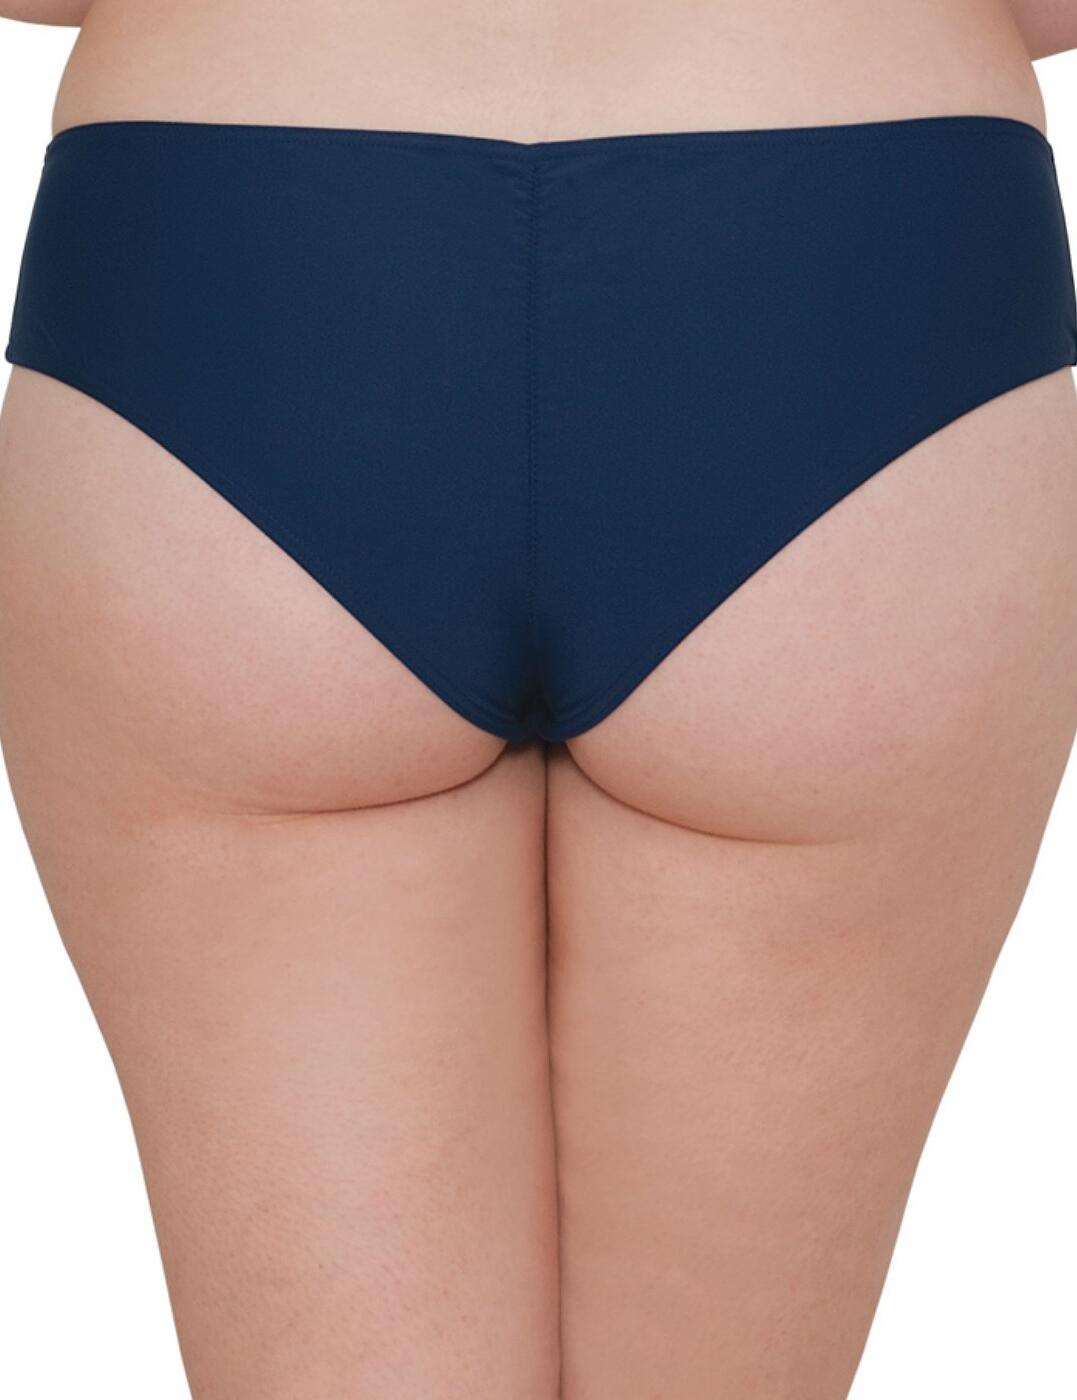 CS4063 Curvy Kate Set Sail Bikini Short  - CS4063 Indigo Mix